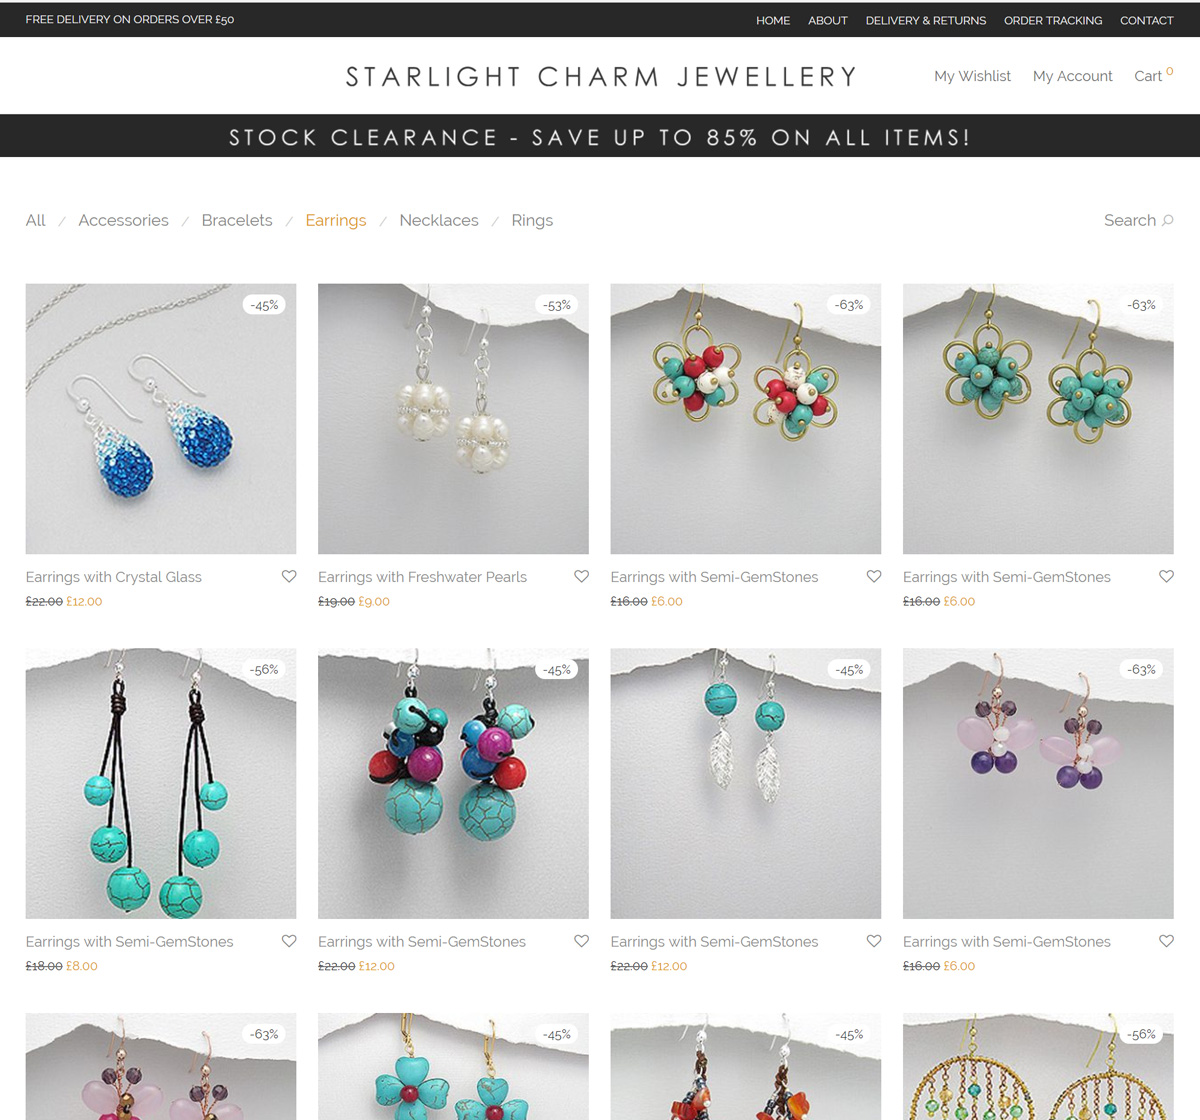 Starlight Charm Jewellery Online Shop